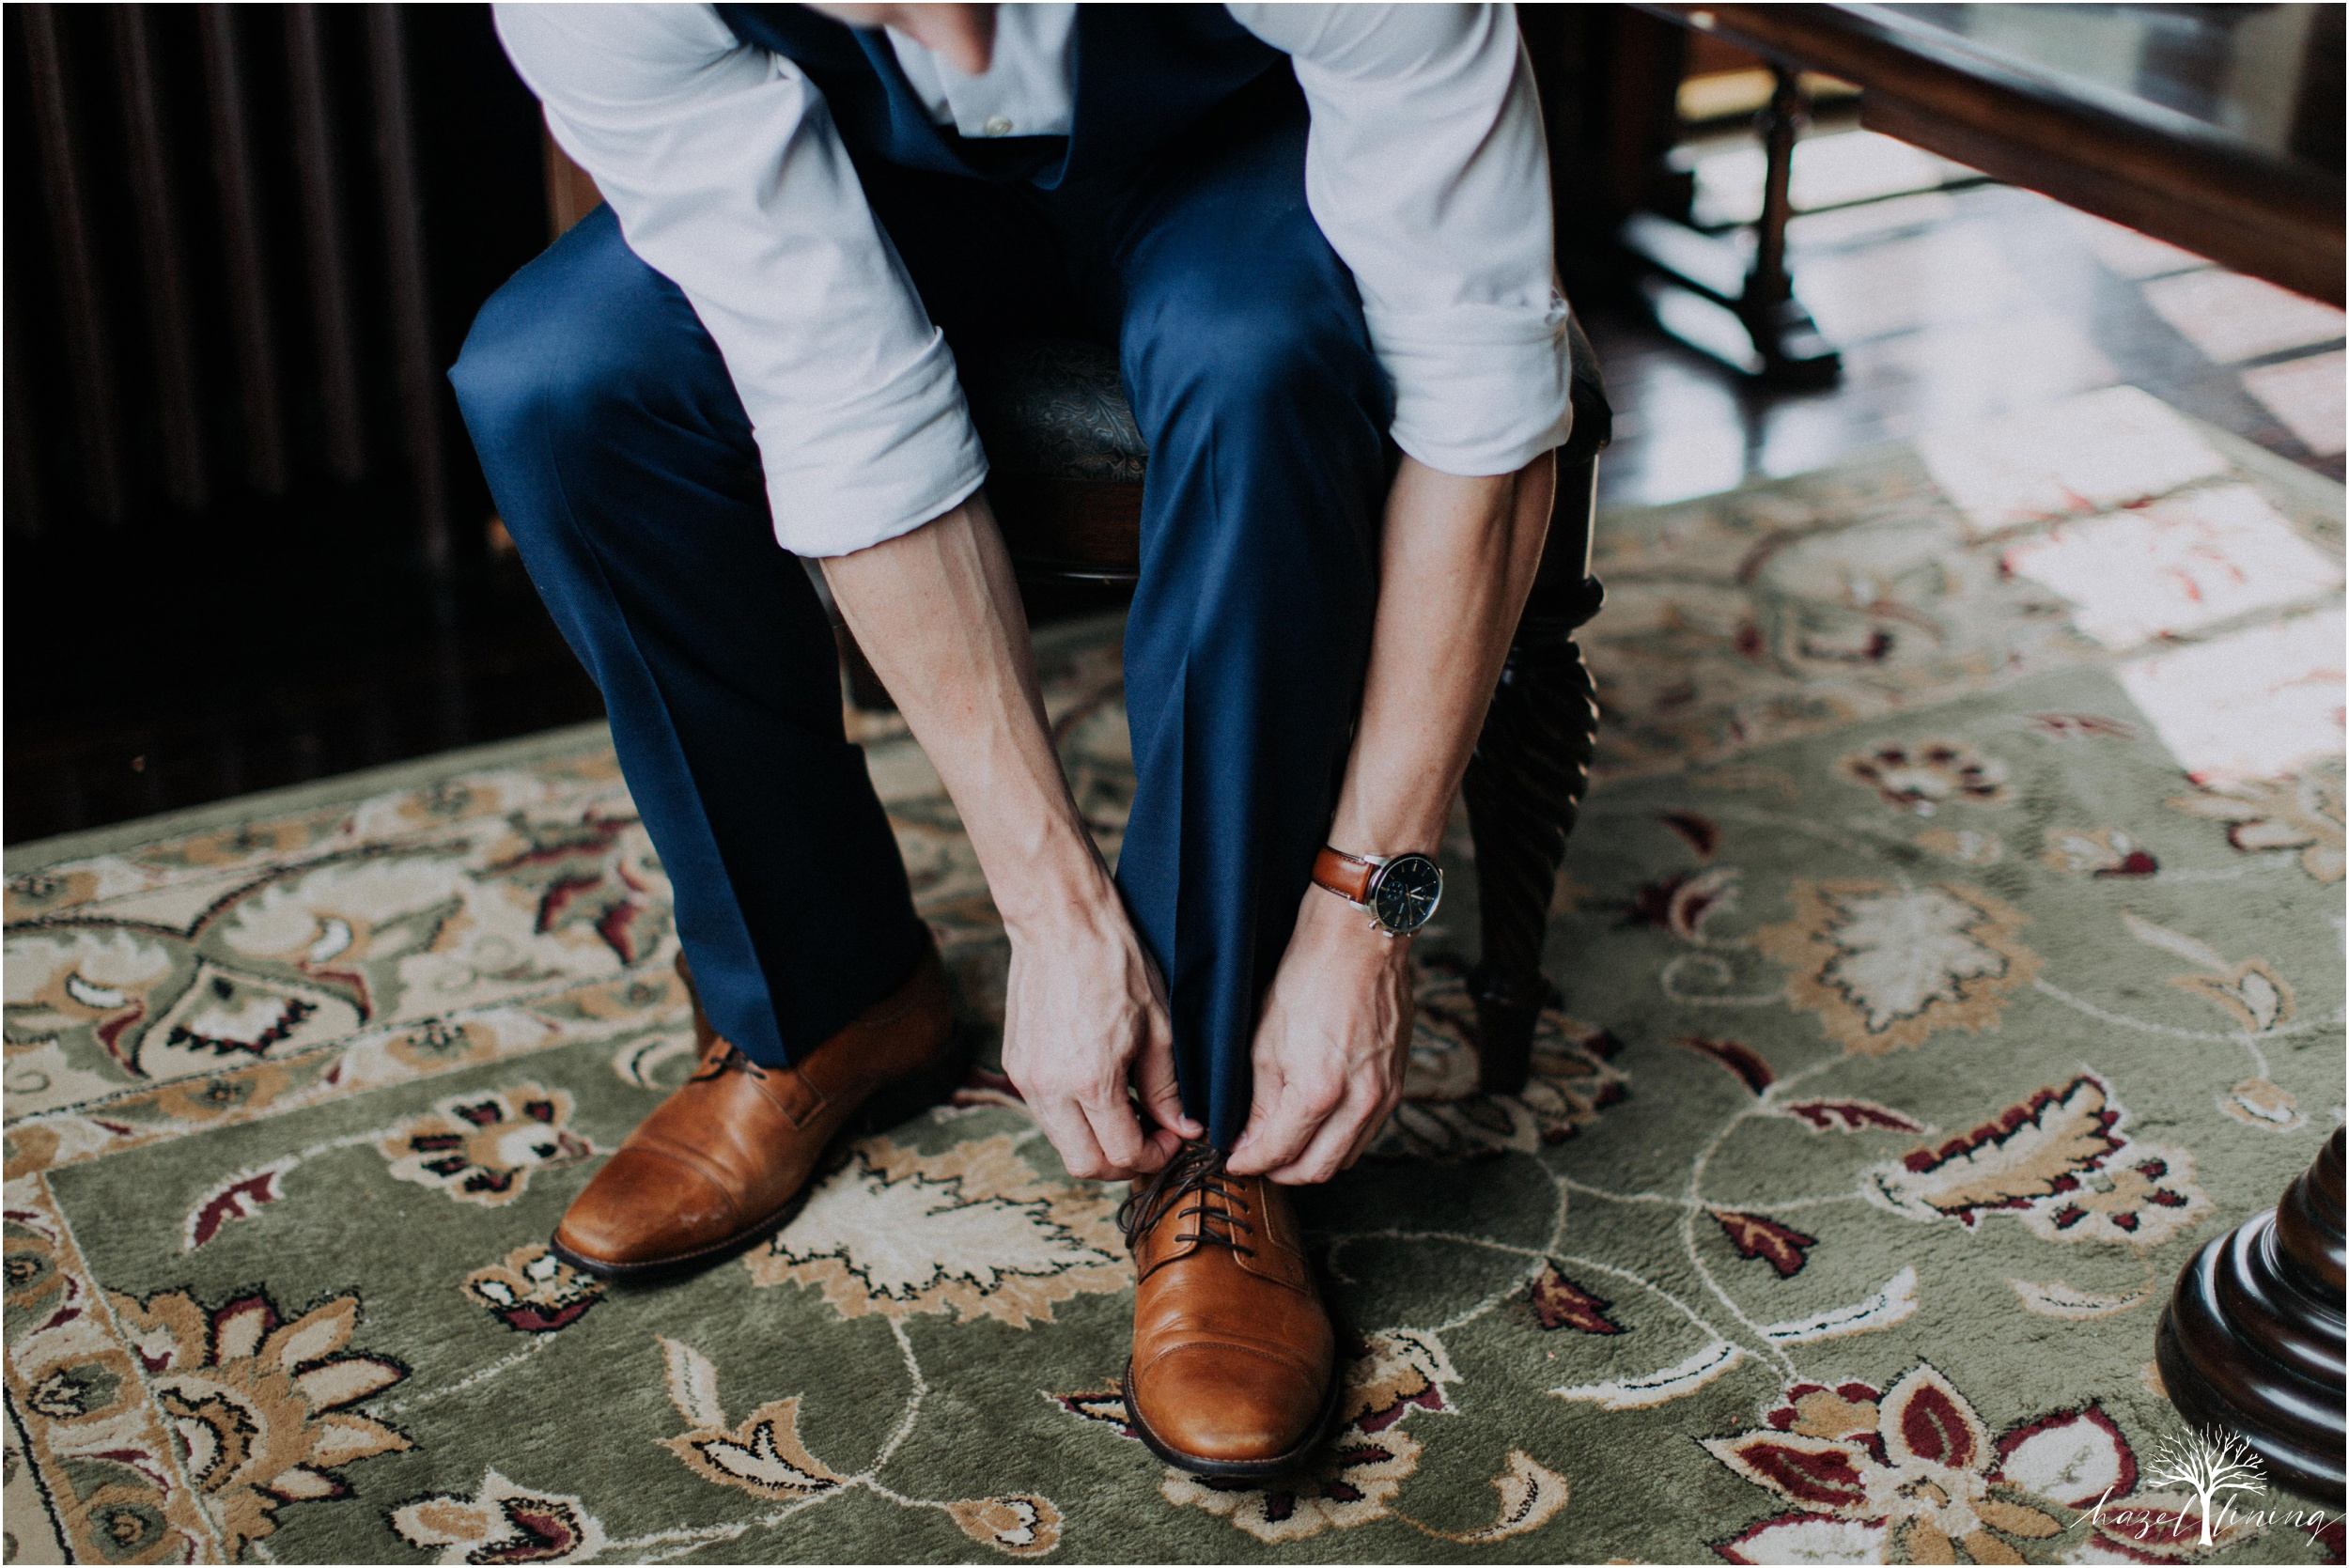 mariah-kreyling-samuel-sherratt-sherrattwiththeworld-peirce-farm-at-witch-hill-boston-massachusetts-wedding-photography-hazel-lining-travel-wedding-elopement-photography_0022.jpg